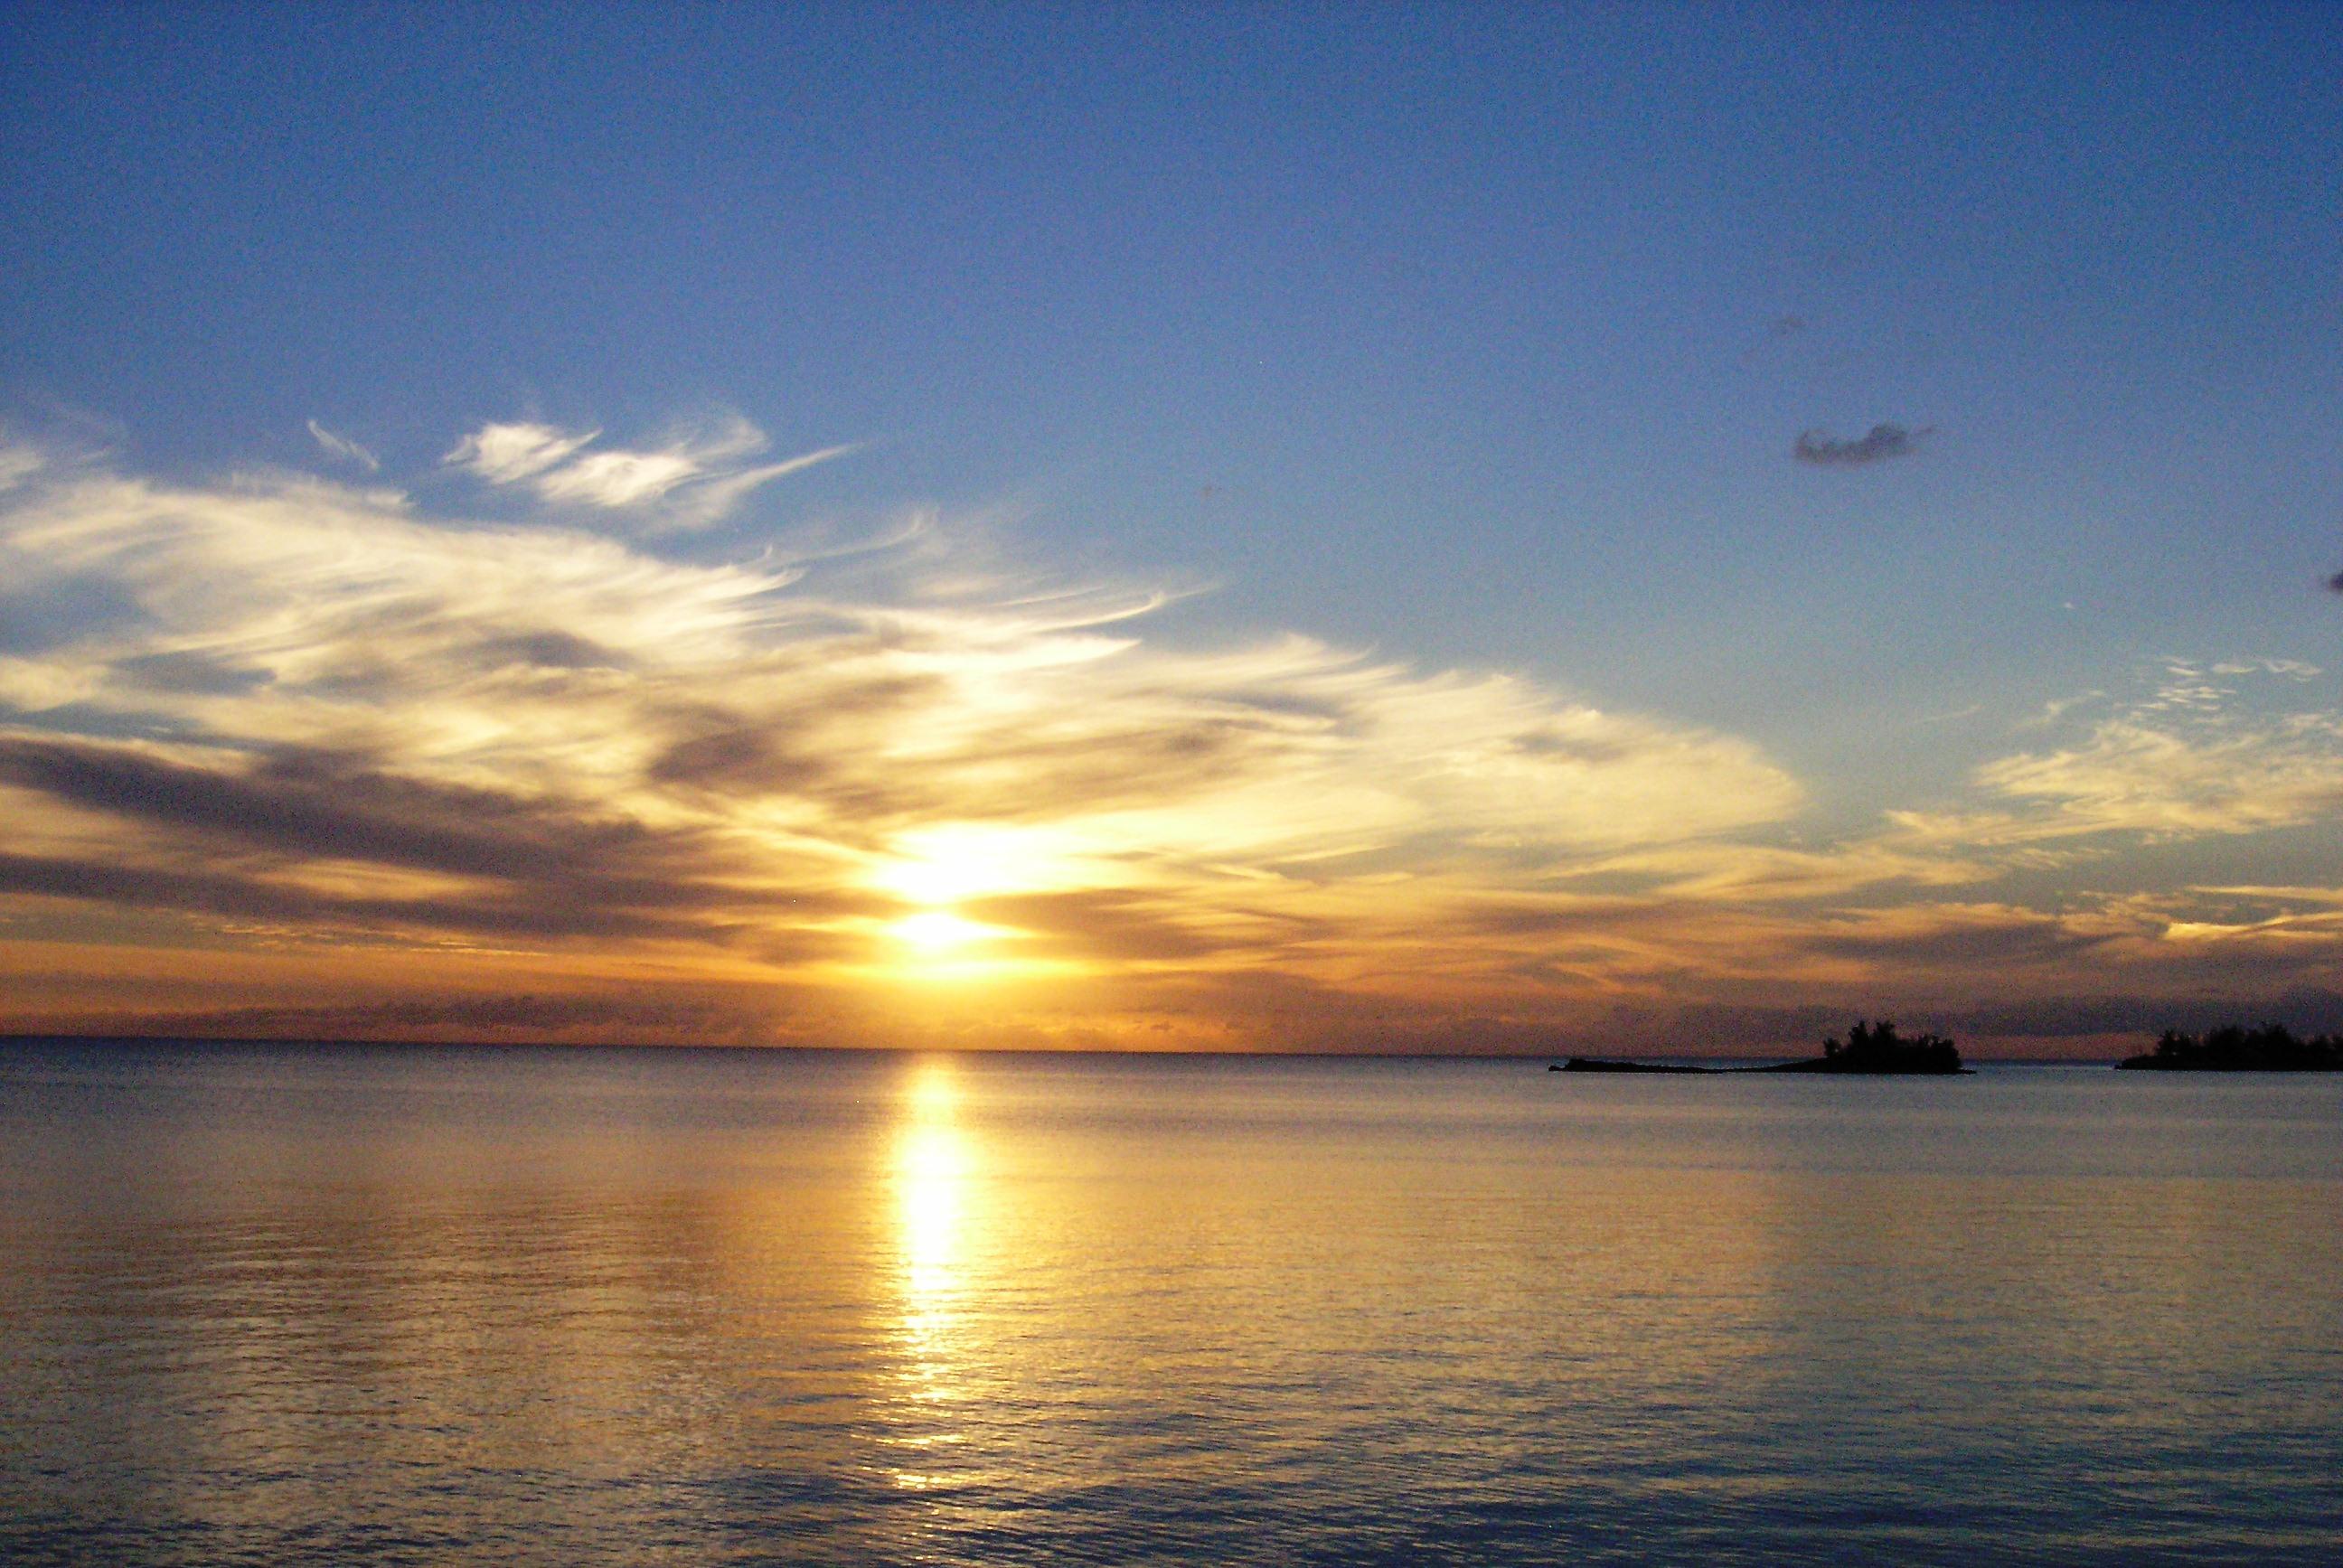 Bahamian Sunset by Laurie Buchanan